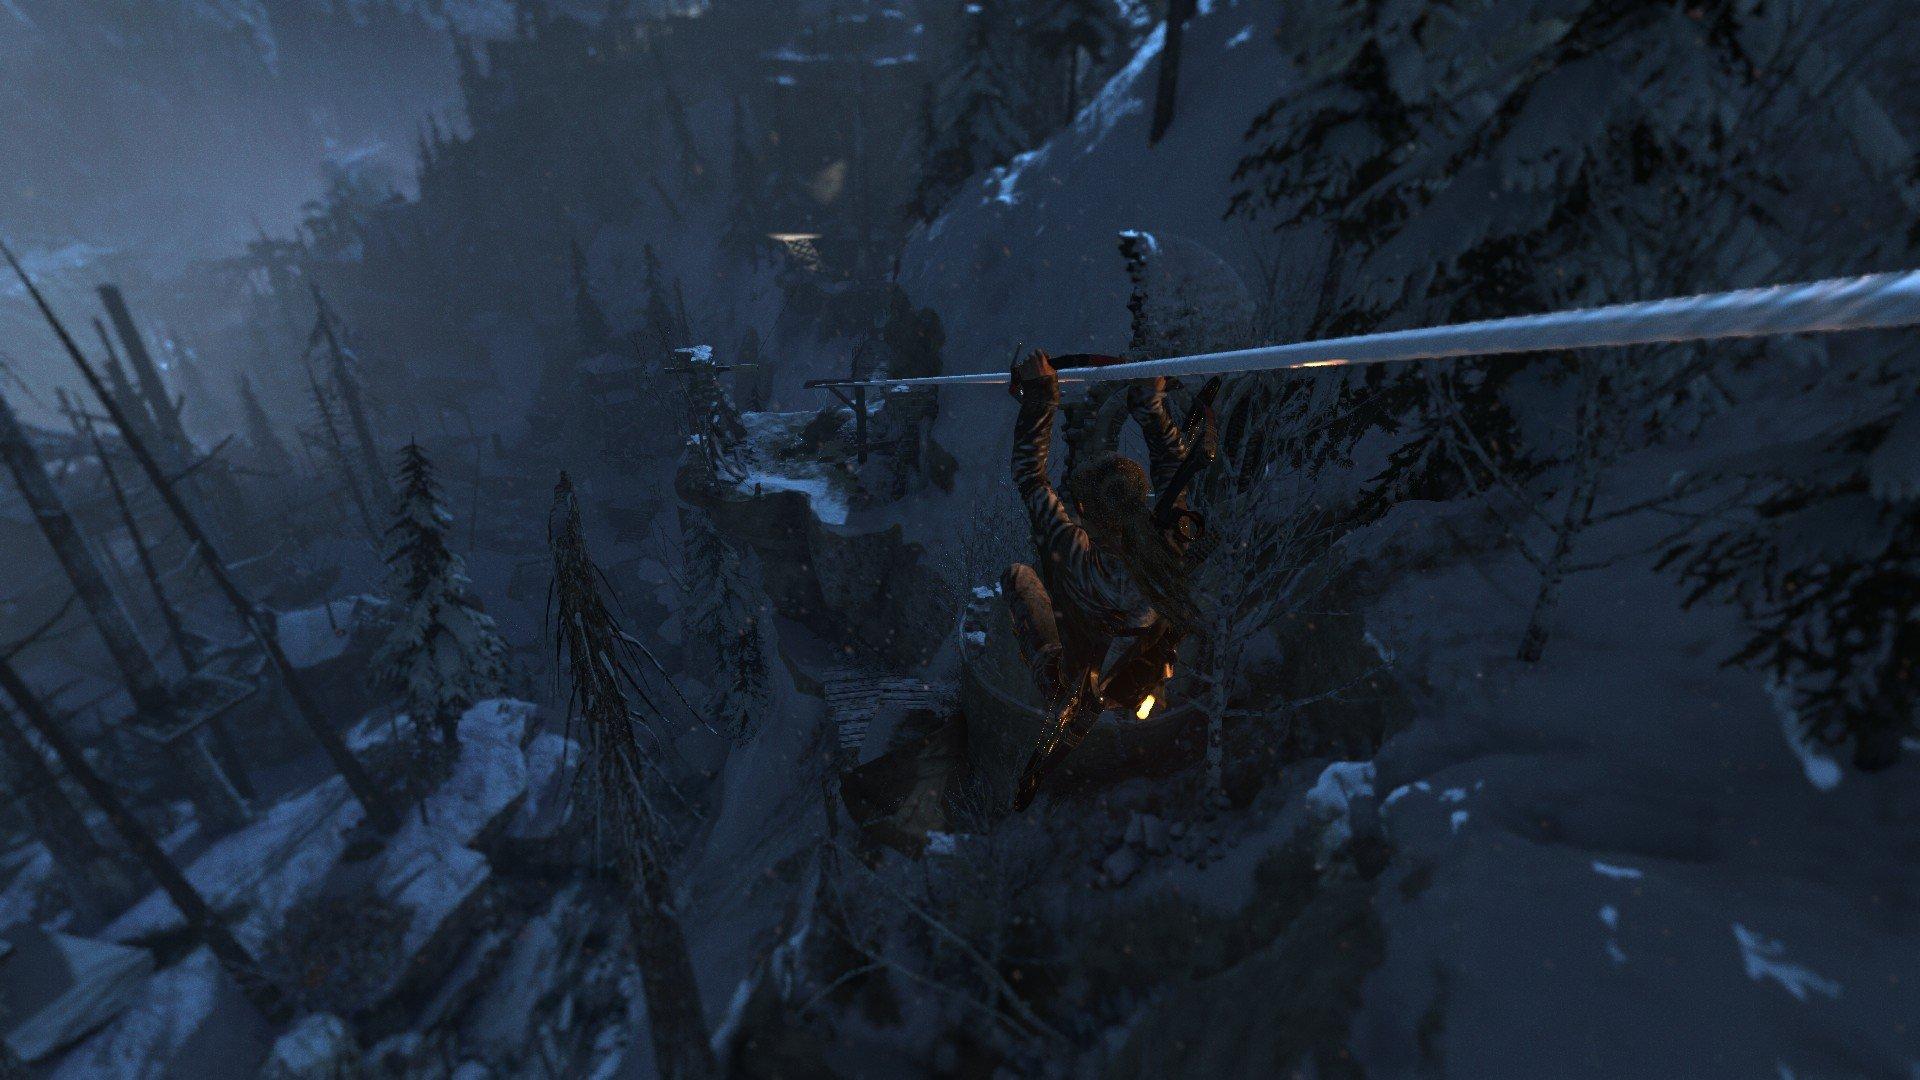 Rise of the Tomb Raider или да когда же этот медведь сдохнет?. - Изображение 22